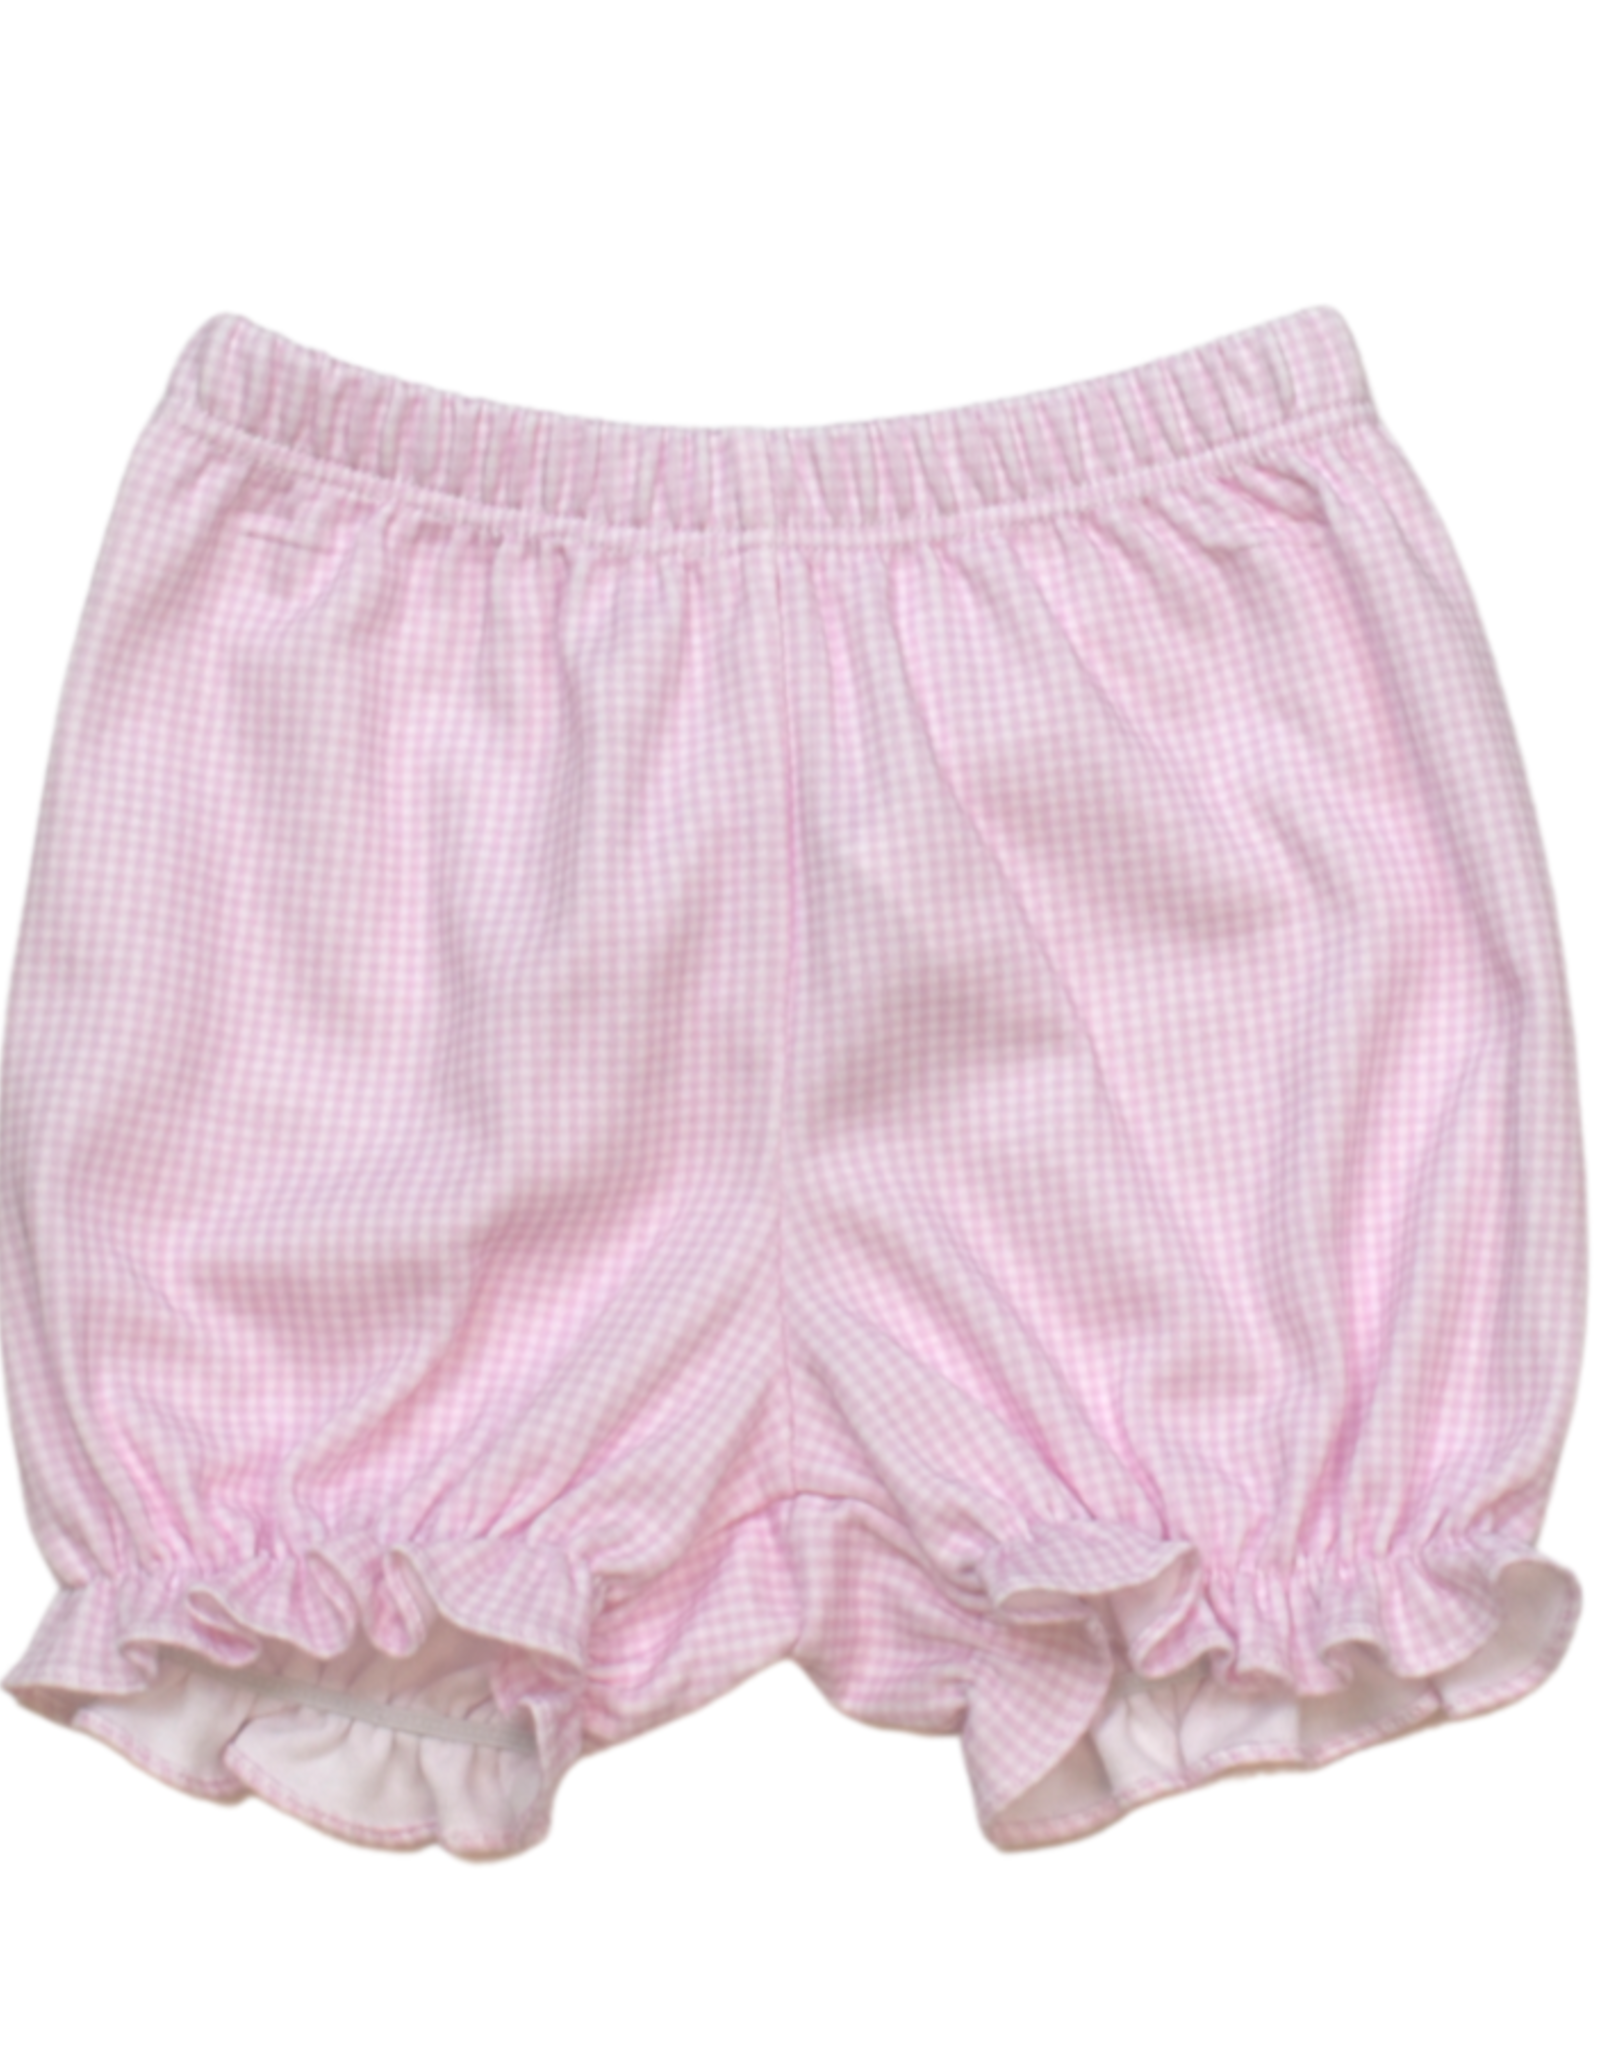 LullabySet Munro Ruffle Bloomer Set, Pink Mini Gingham Pima